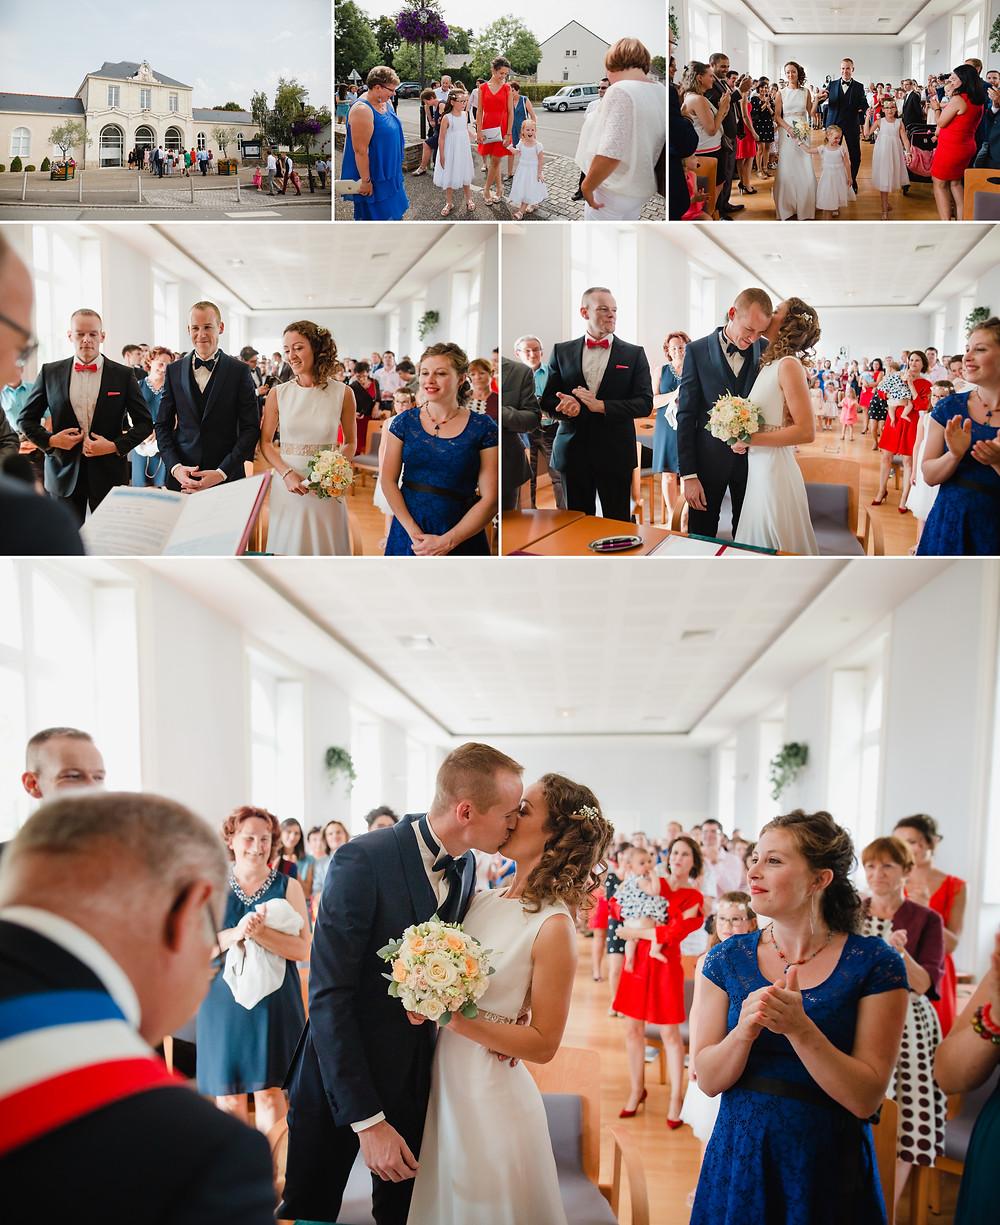 mariage loire-atlantique 44